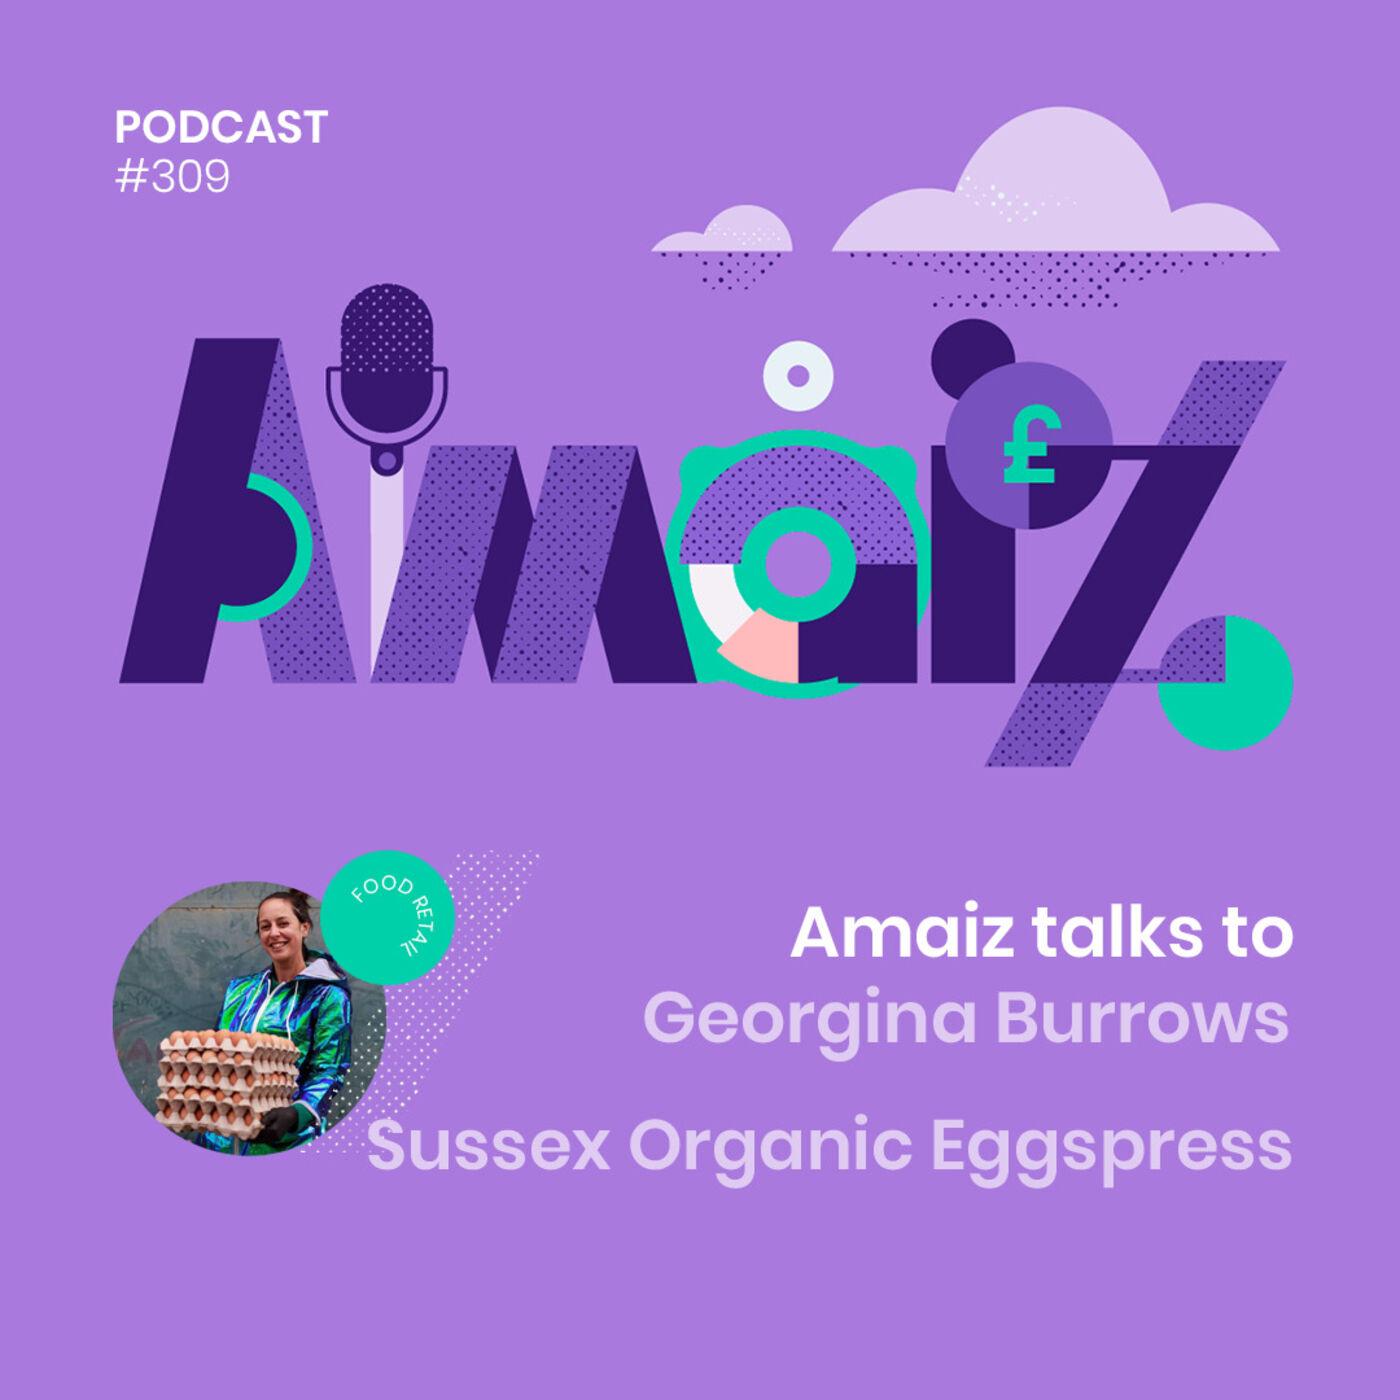 Business under Lockdown - Amaiz talks to Georgina Burrows of Sussex Organic Eggspress